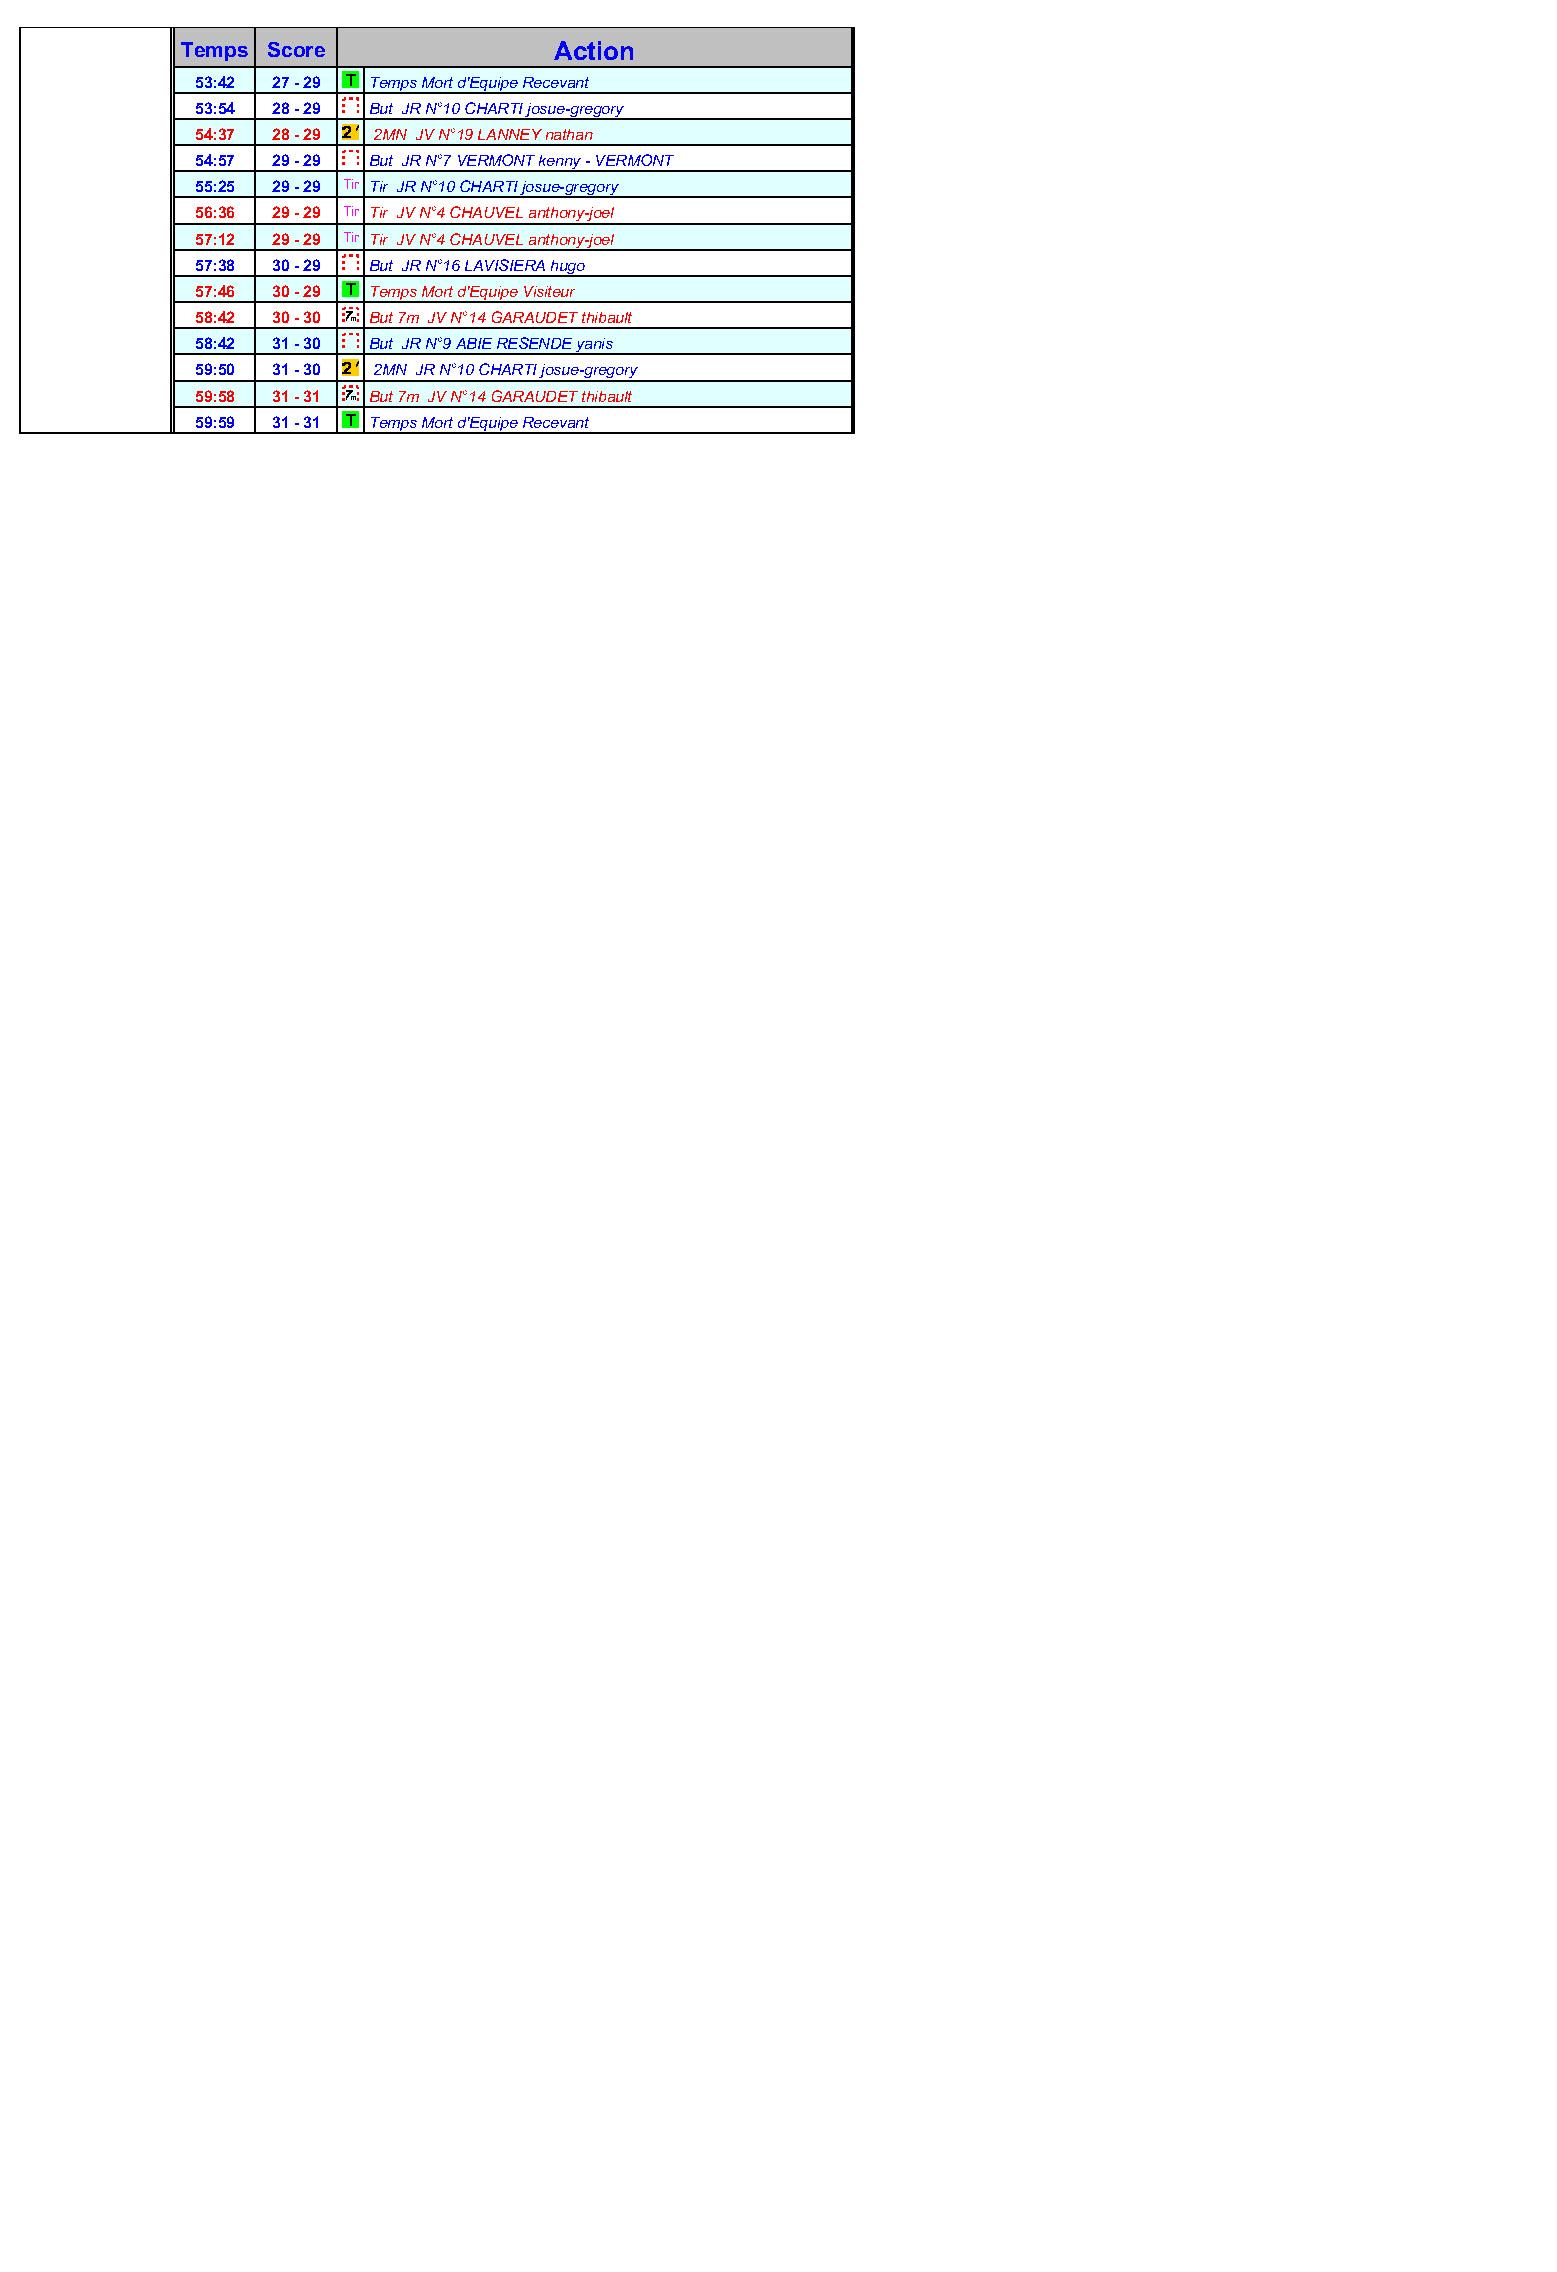 Copy of U18G 31 313.jpg